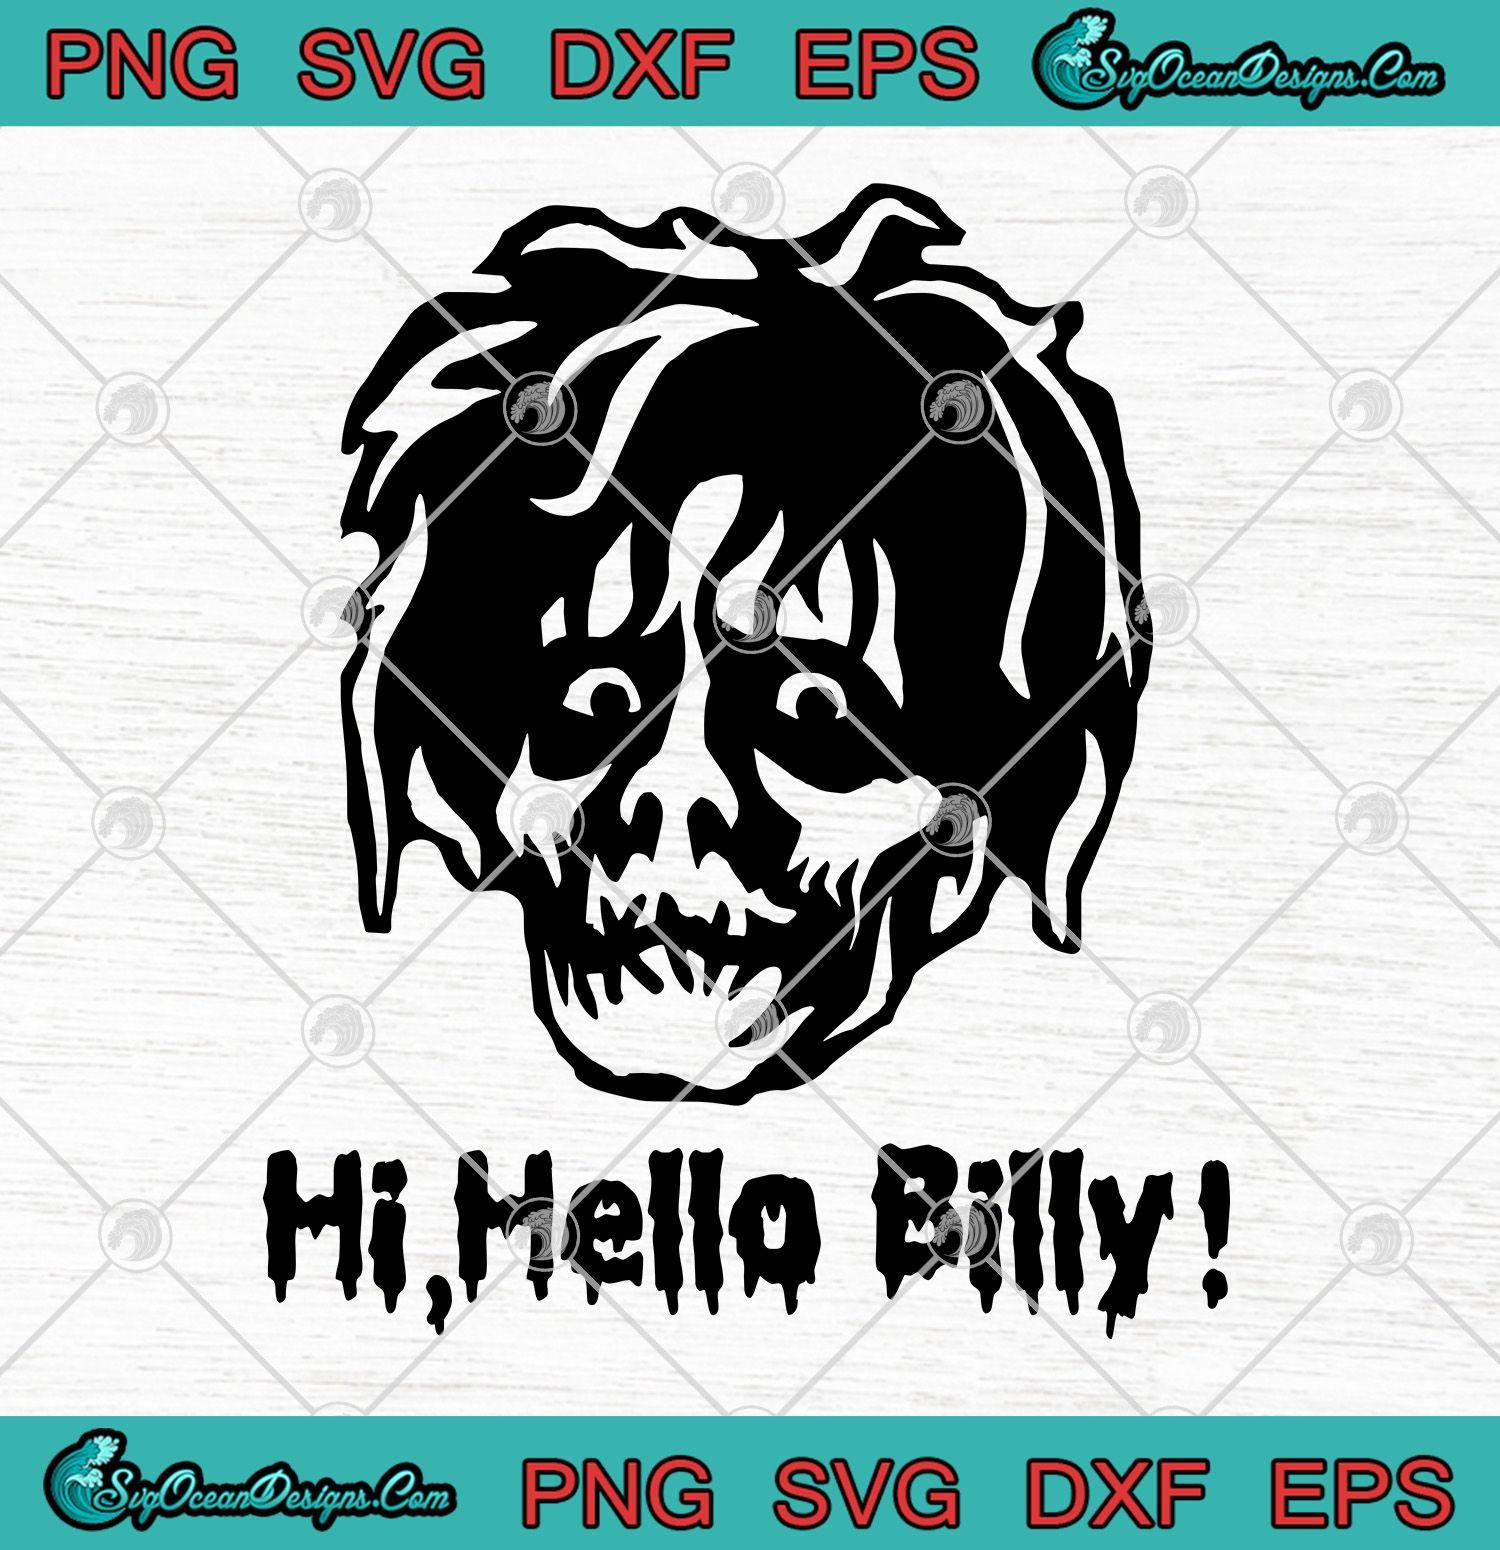 Hocus Pocus Hi Hello Billy Svg Png Eps Dxf Svg Cricut Cricut Svg